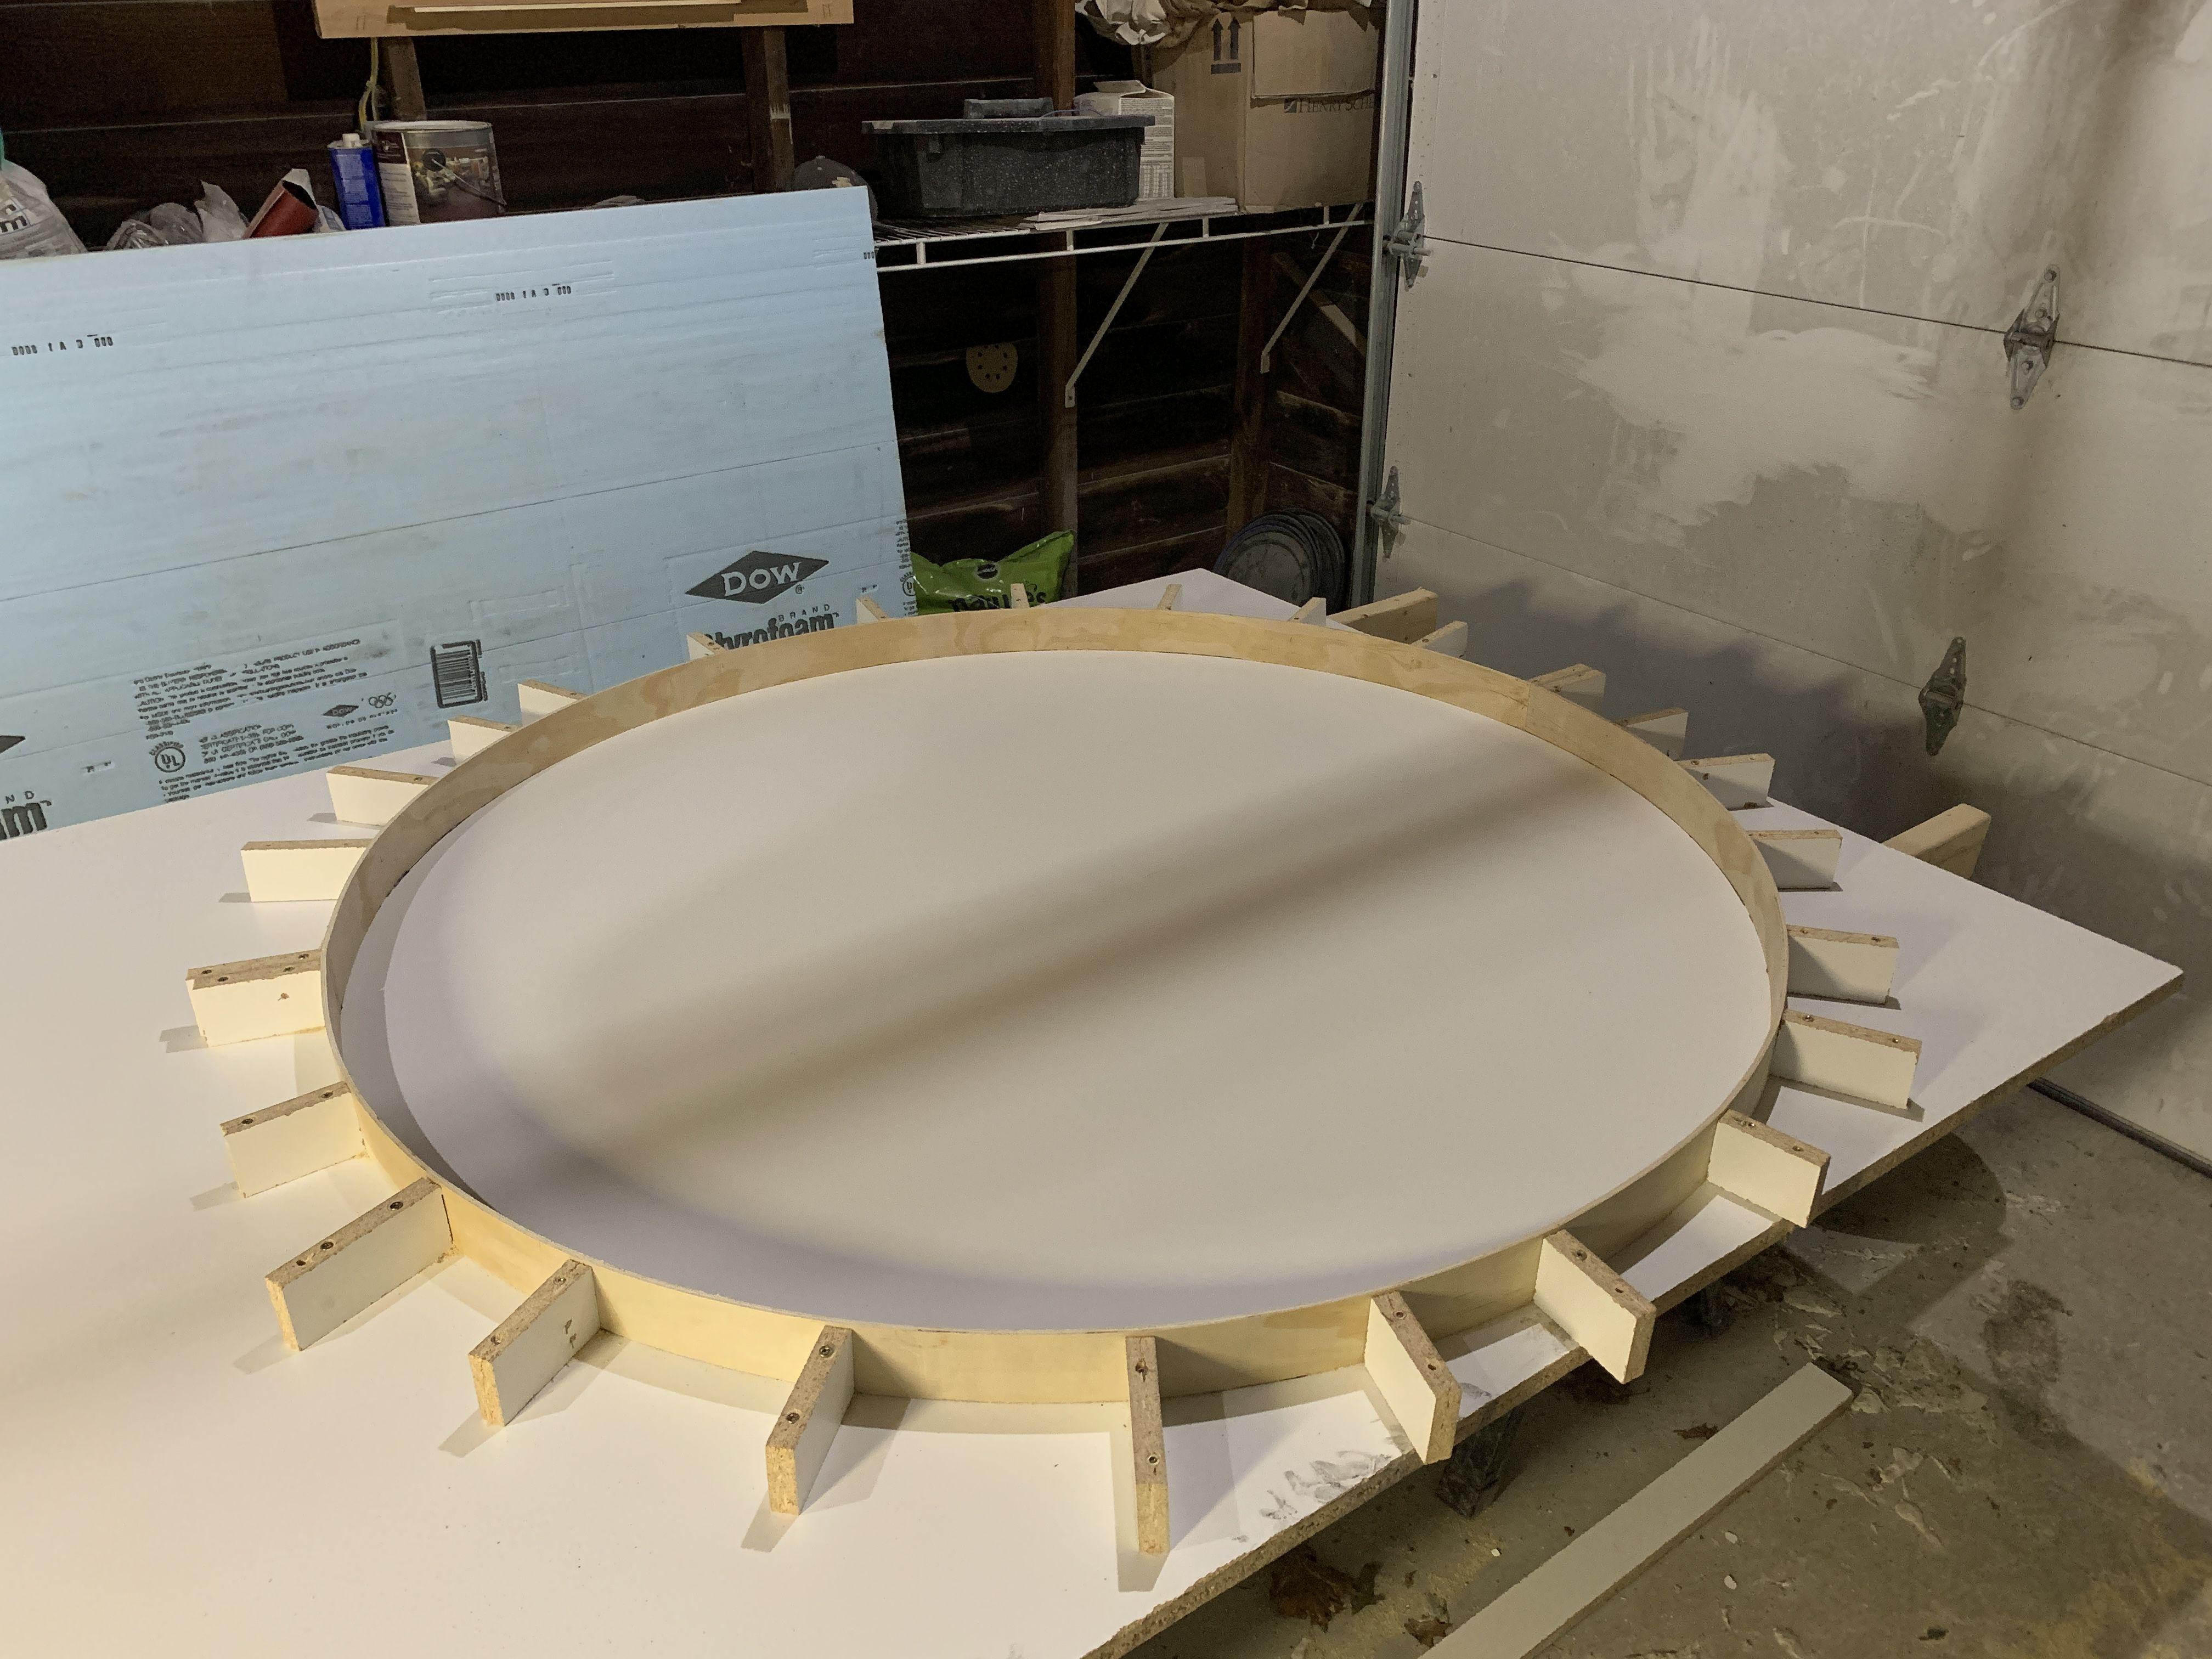 Concrete Round Table Mold In 2020 Concrete Countertops Molding